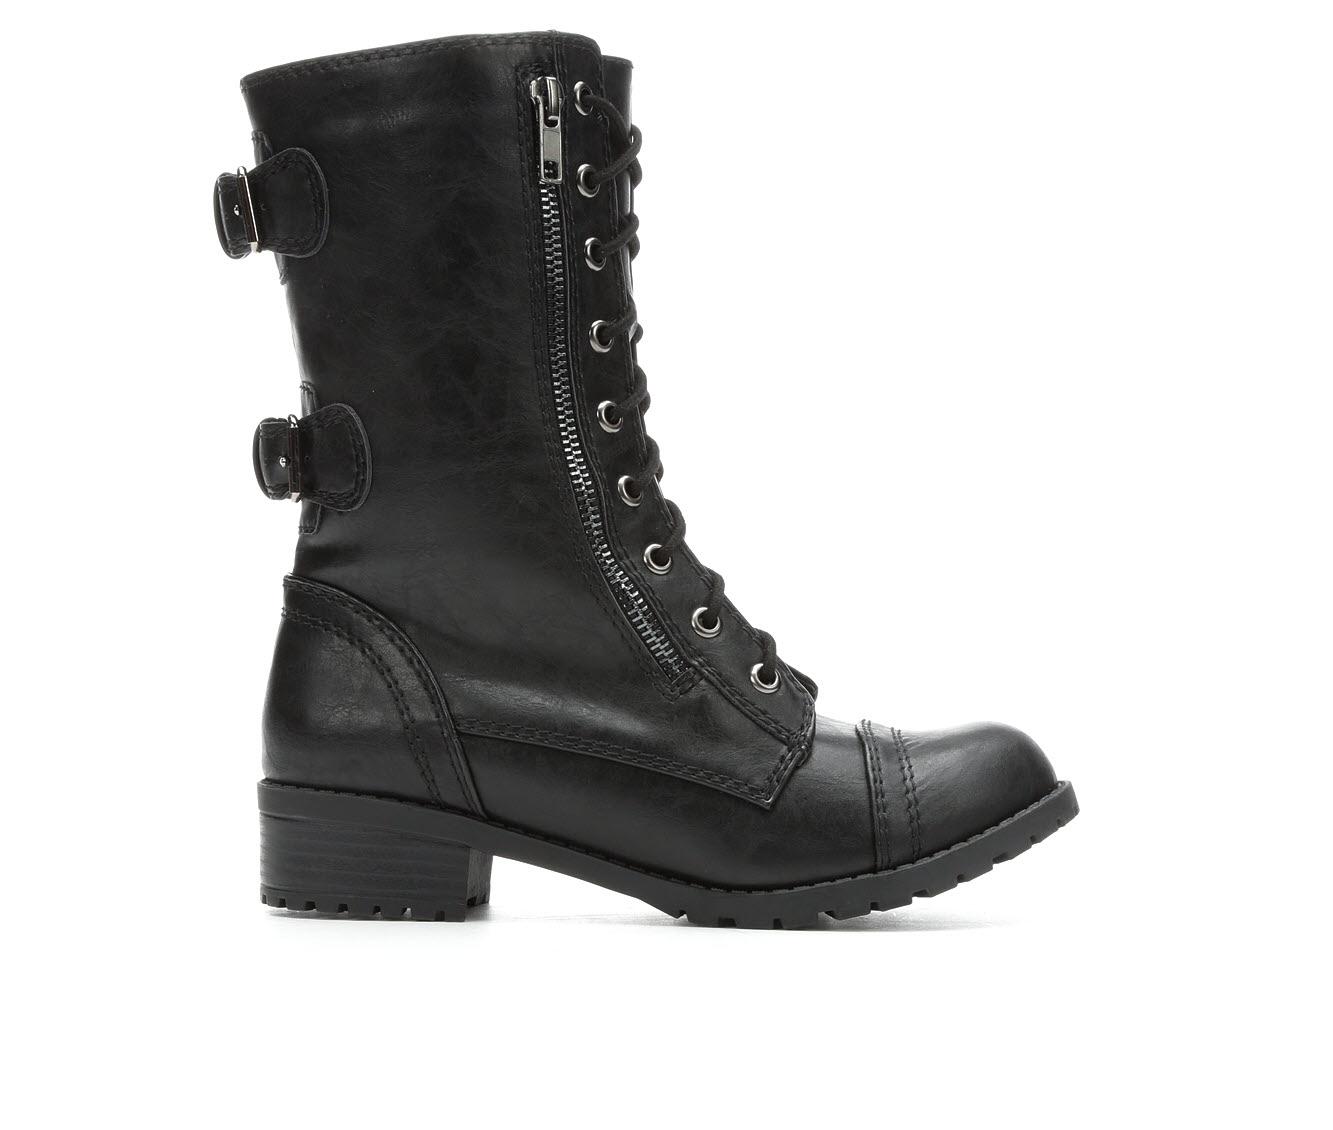 Unr8ed Dome Women's Boots (Black - Faux Leather)